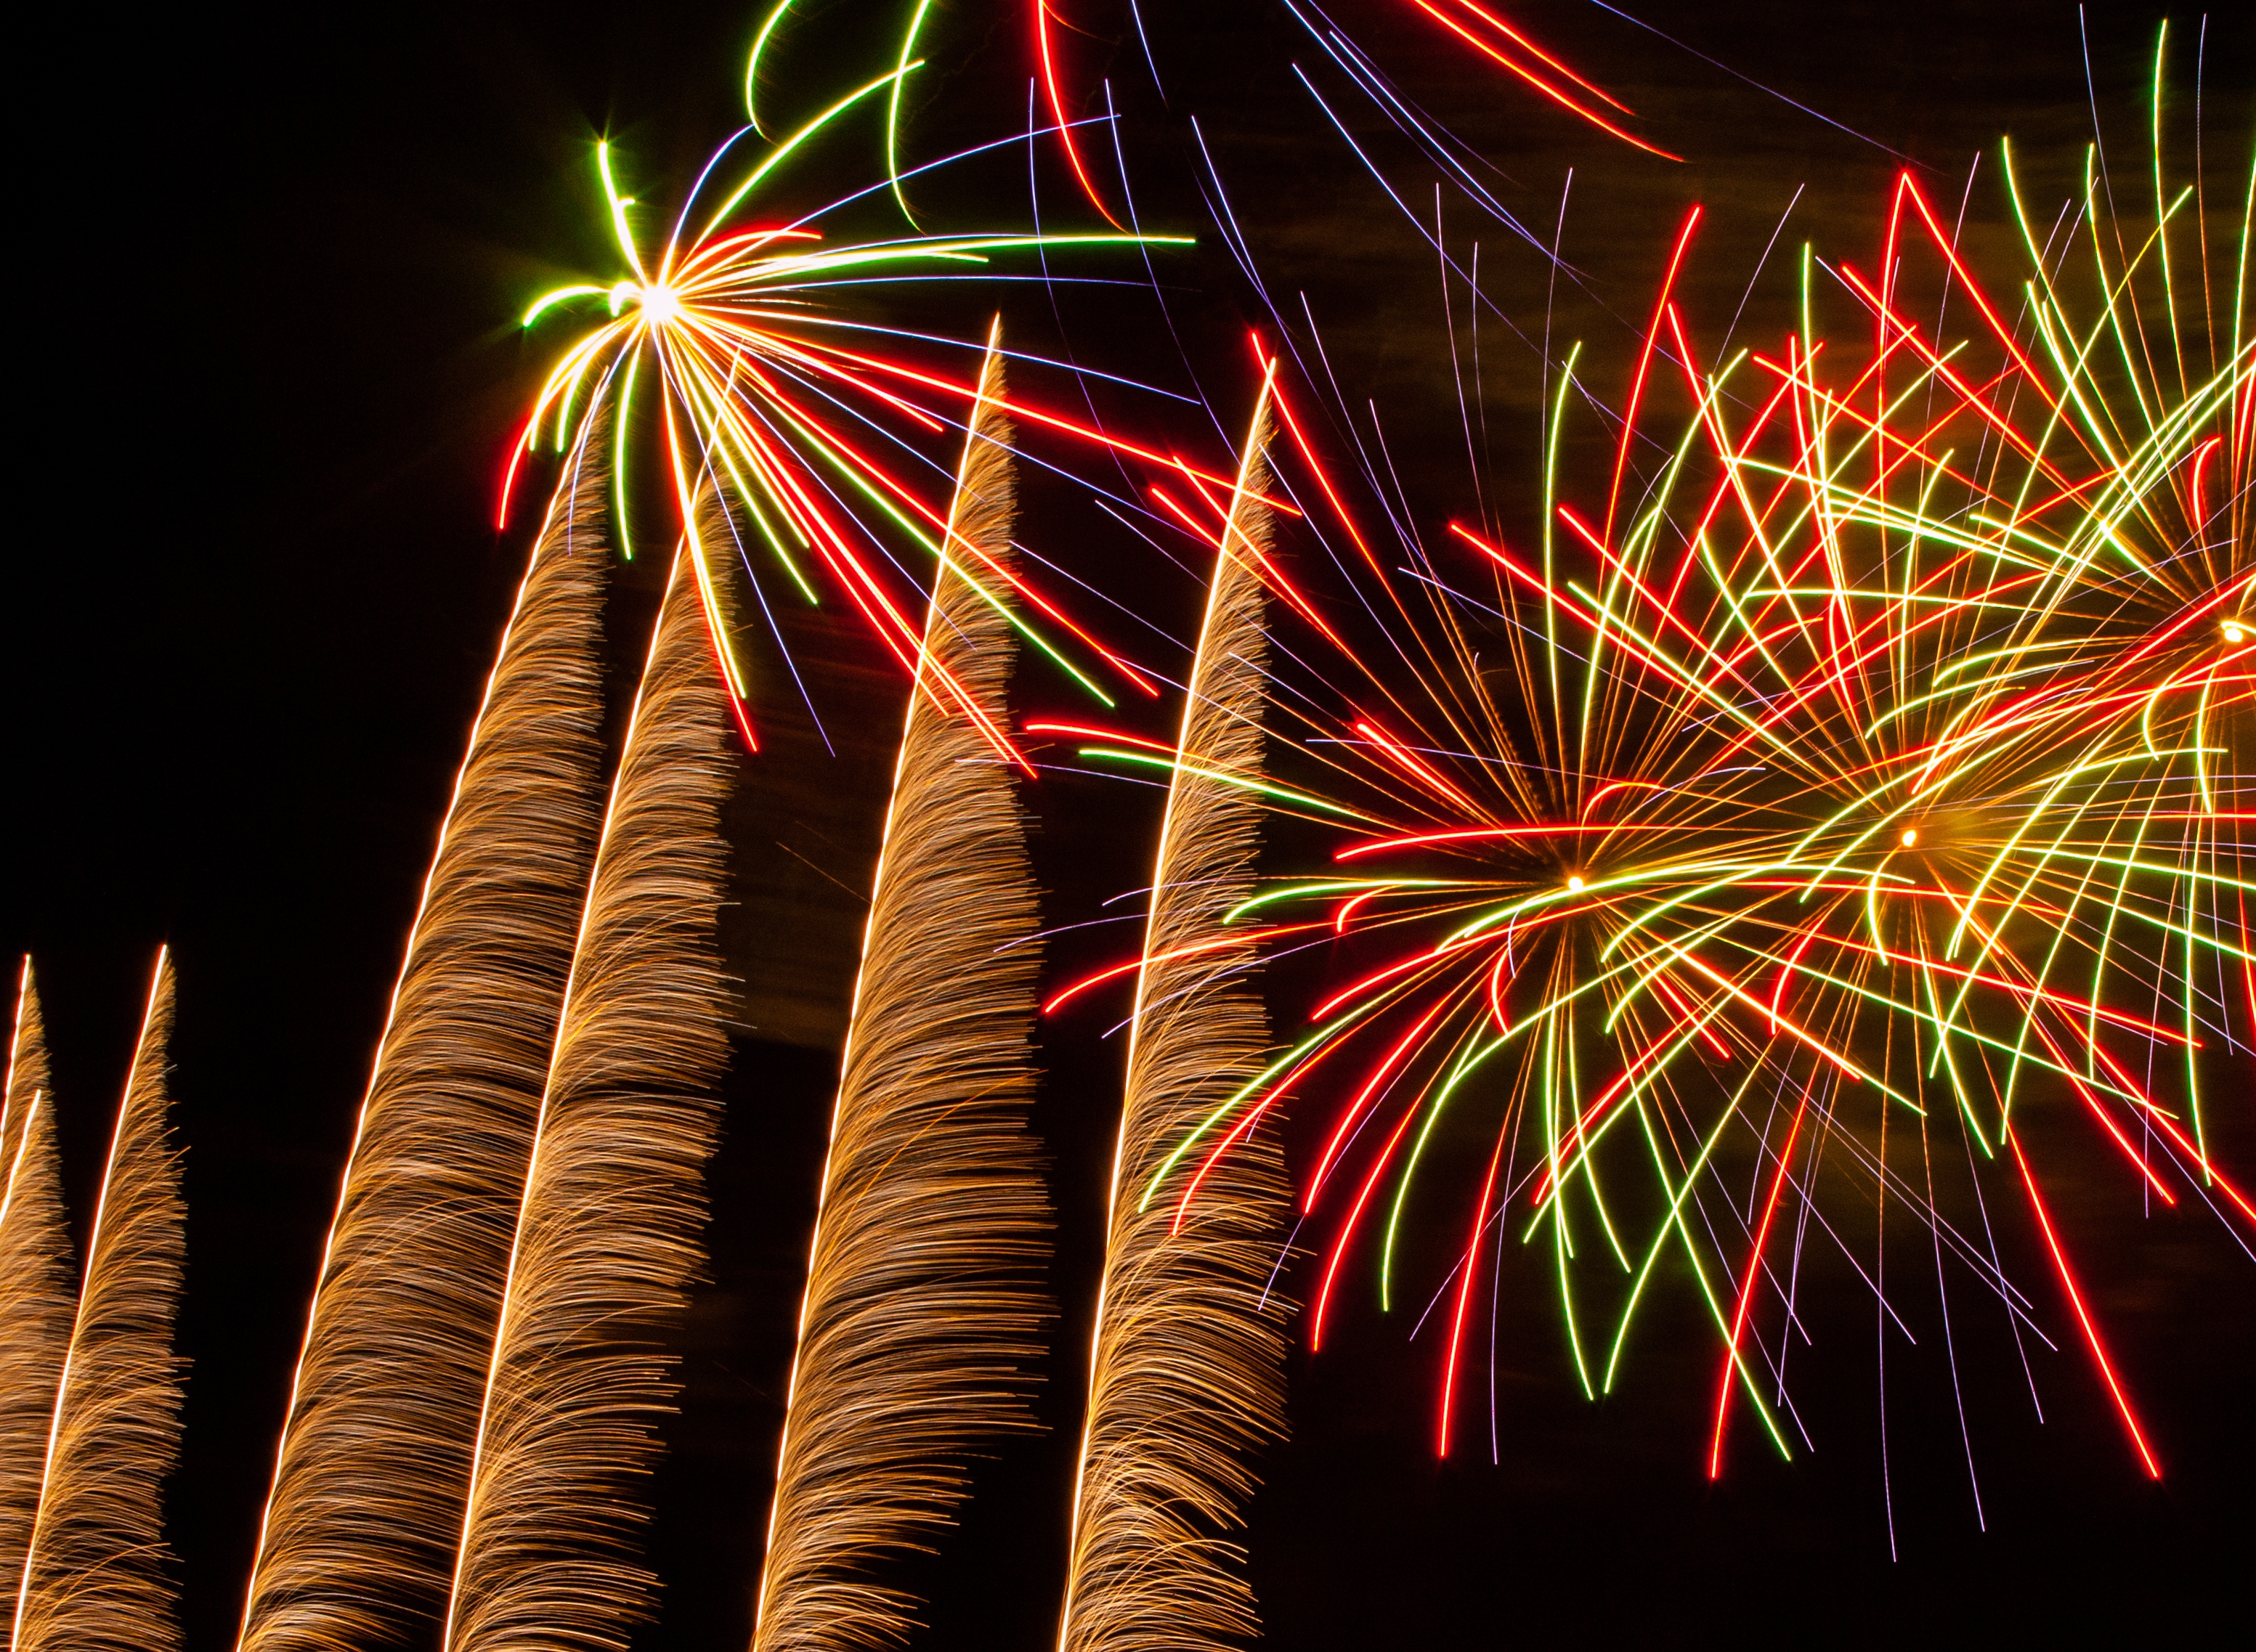 Lambeth_Fireworks_13.jpg